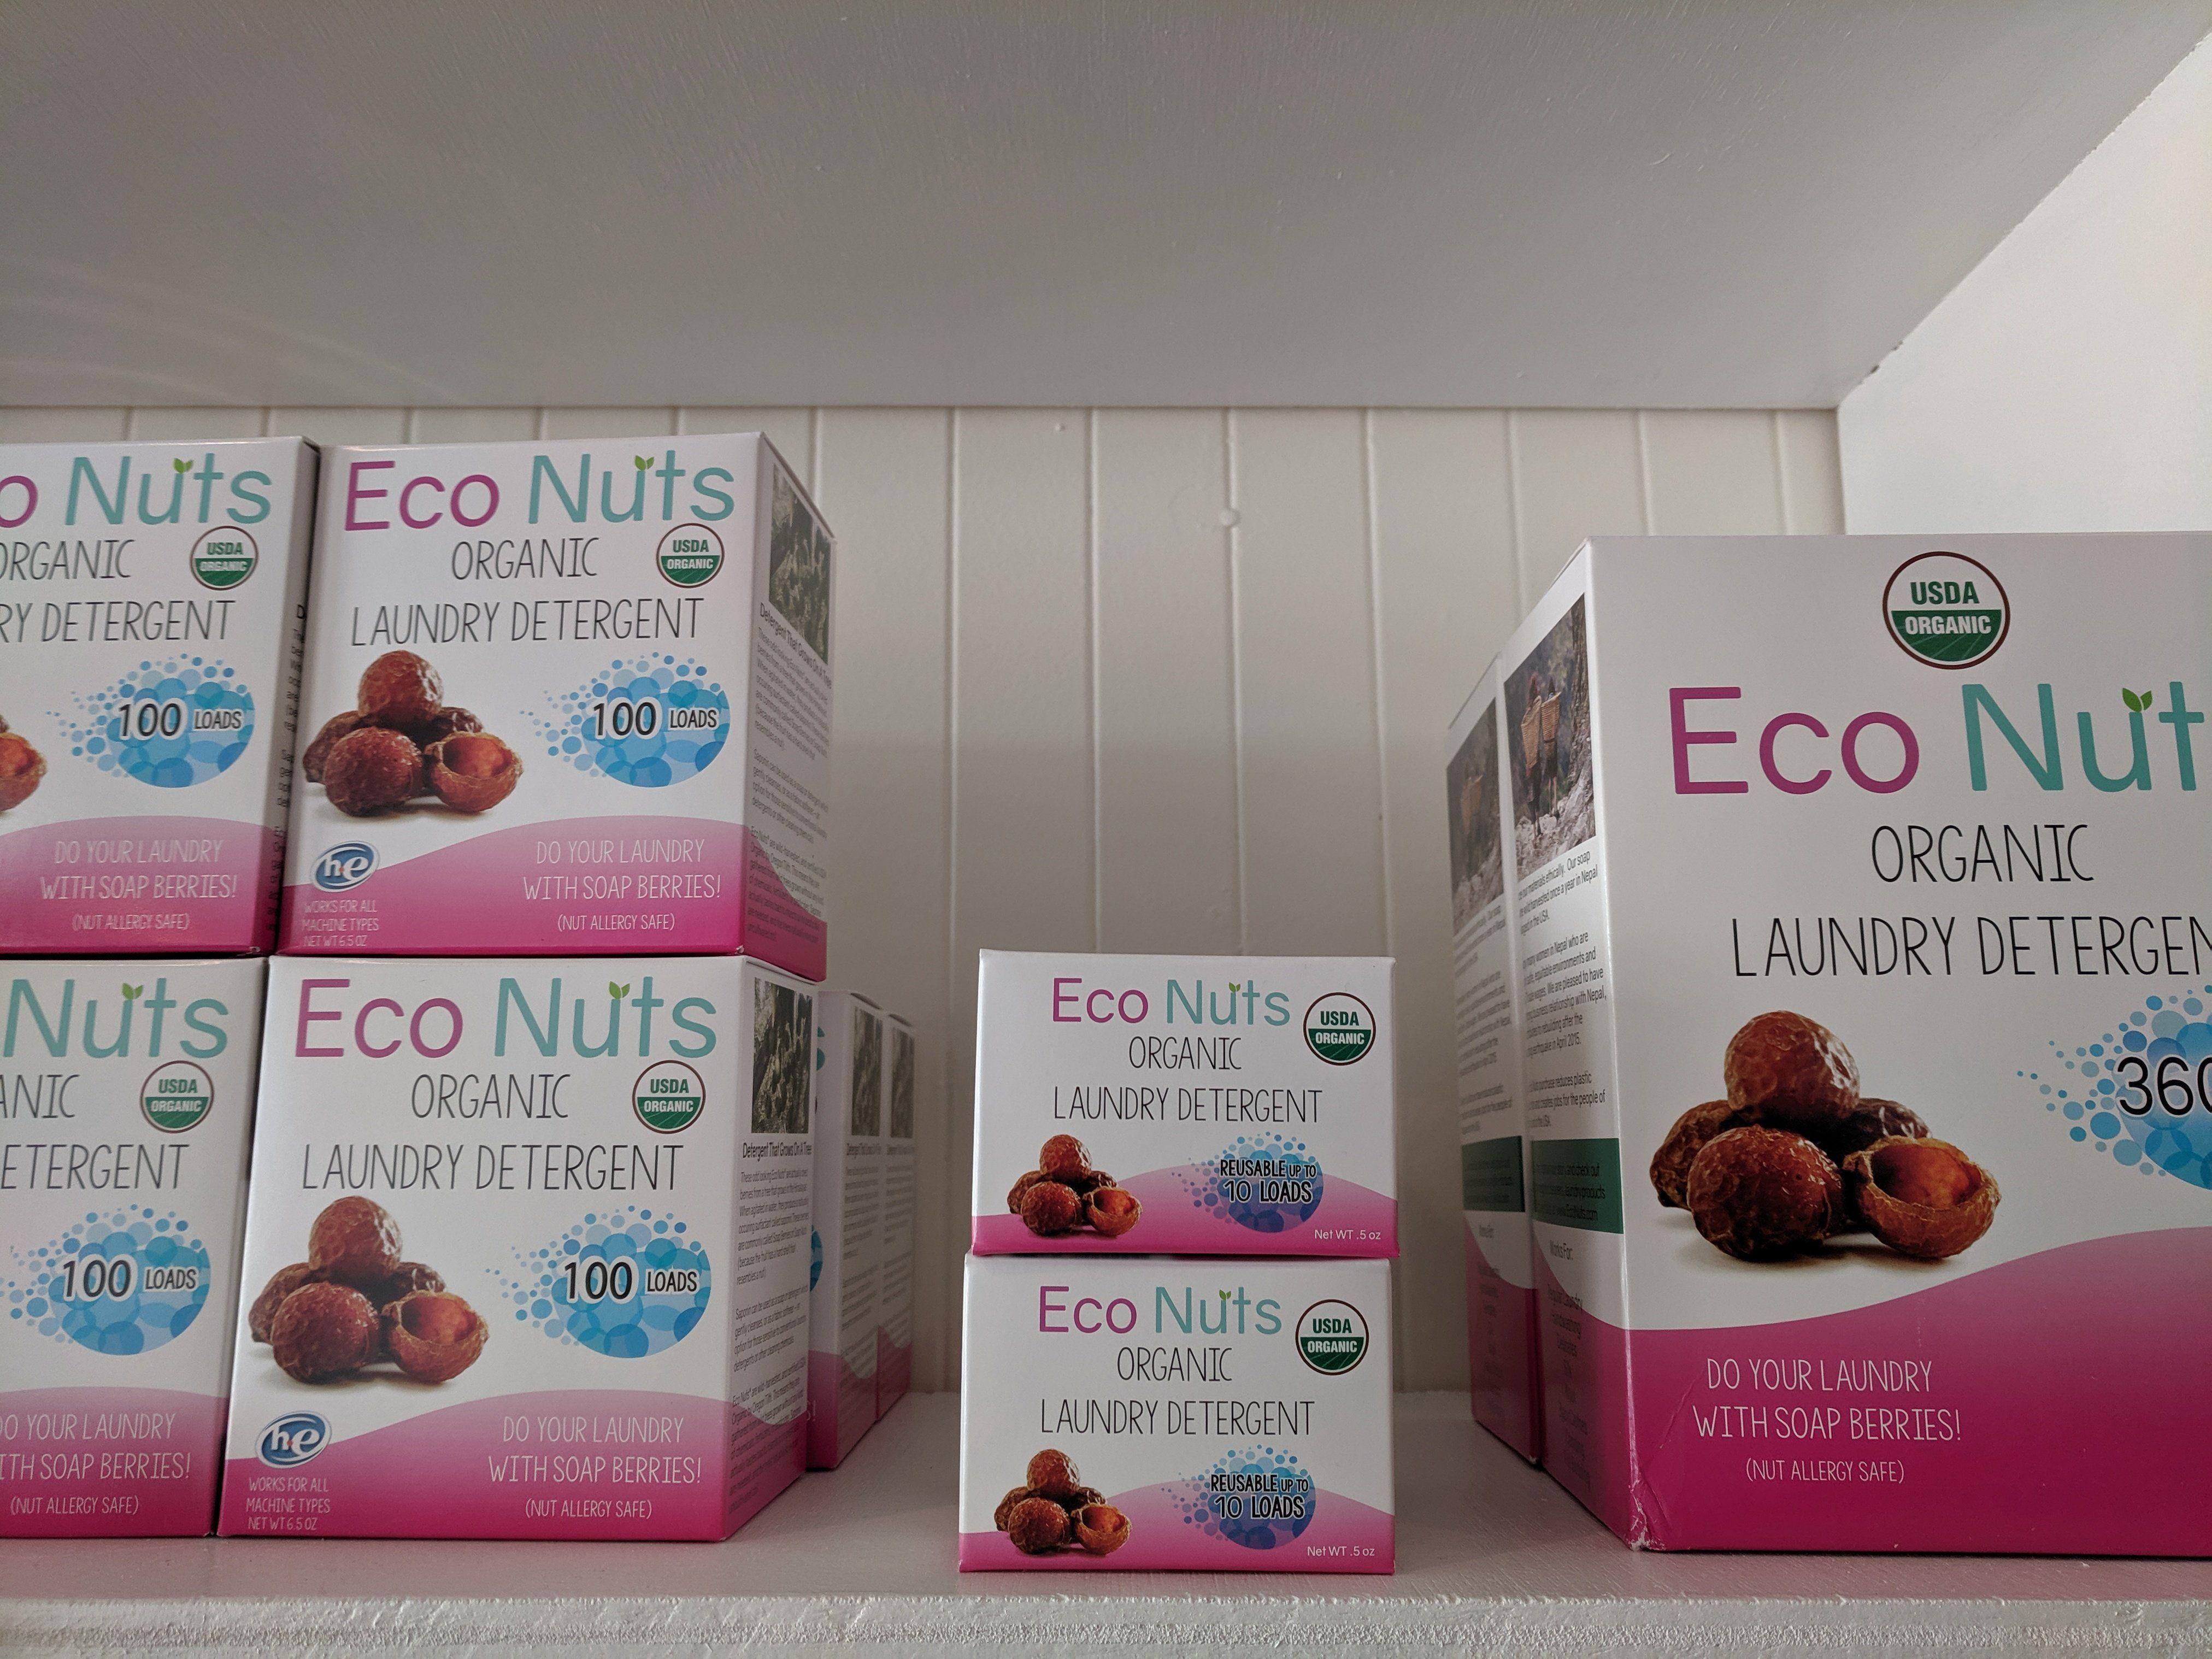 Eco Nuts Organic Laundry Detergent Organic Laundry Detergent